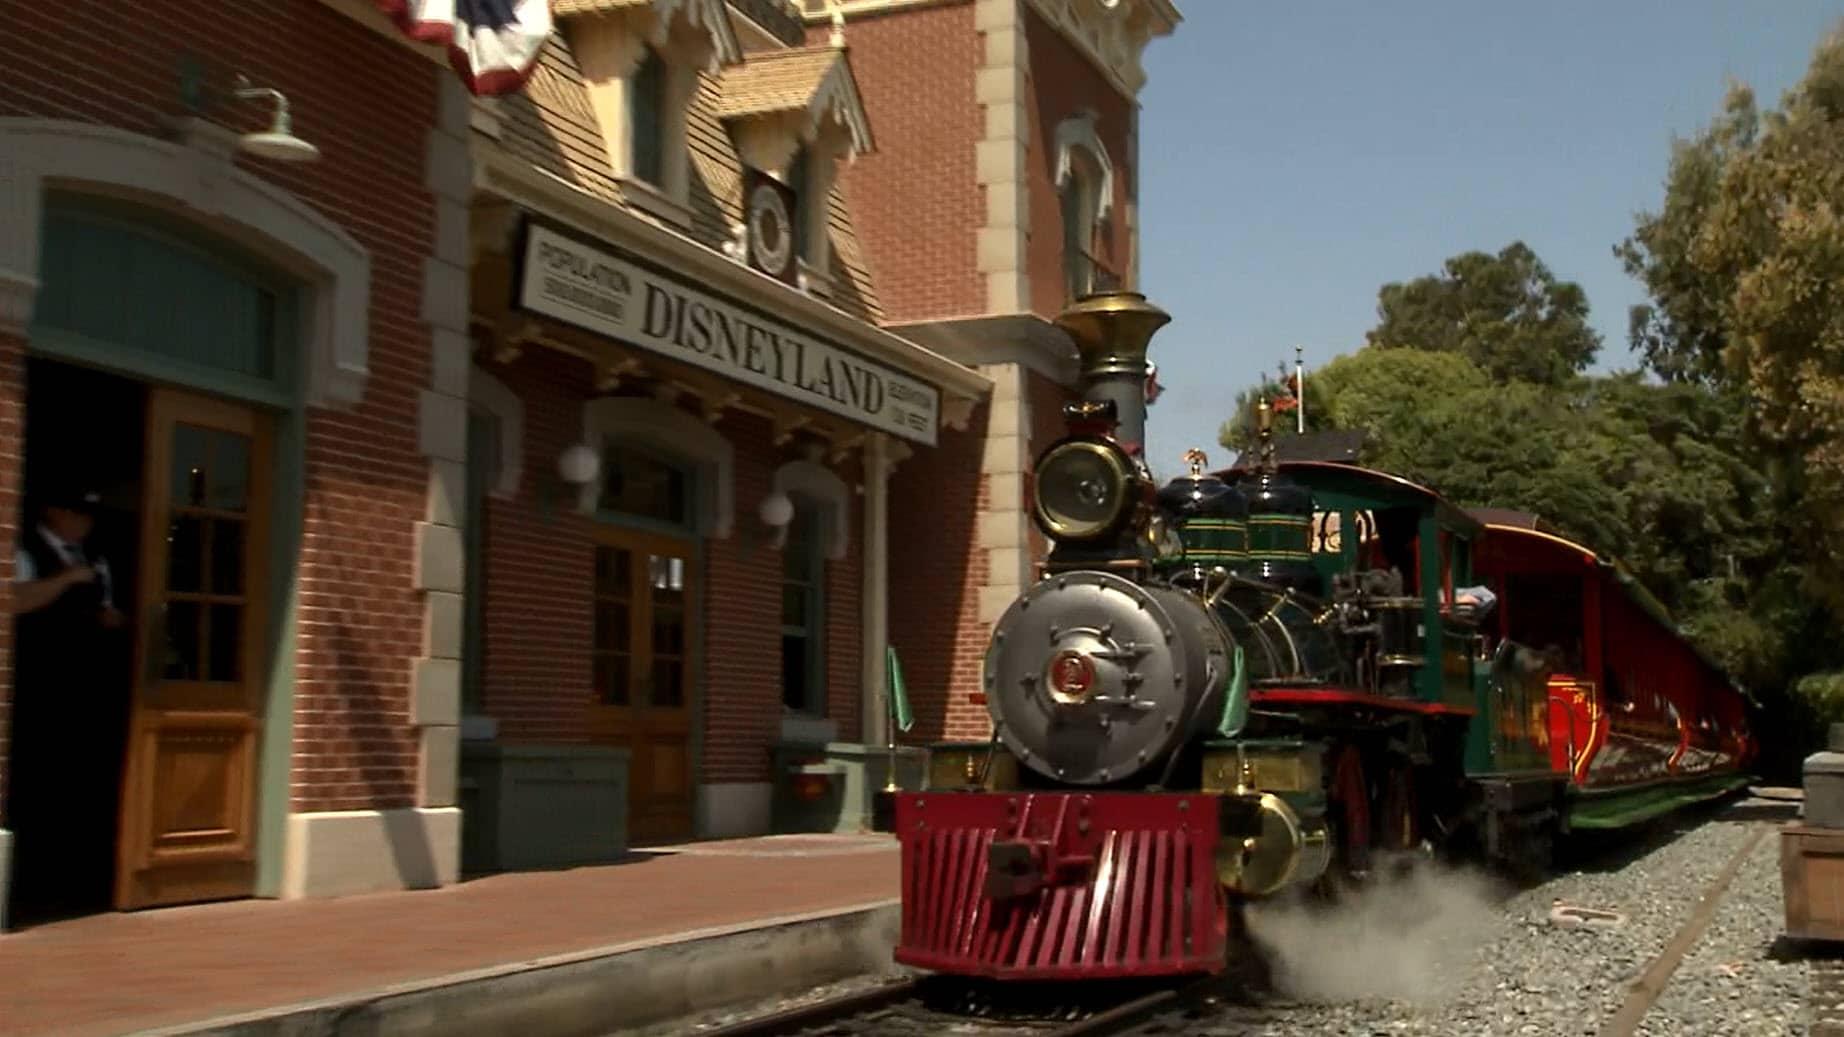 Disneyland - Disneyland Railroad